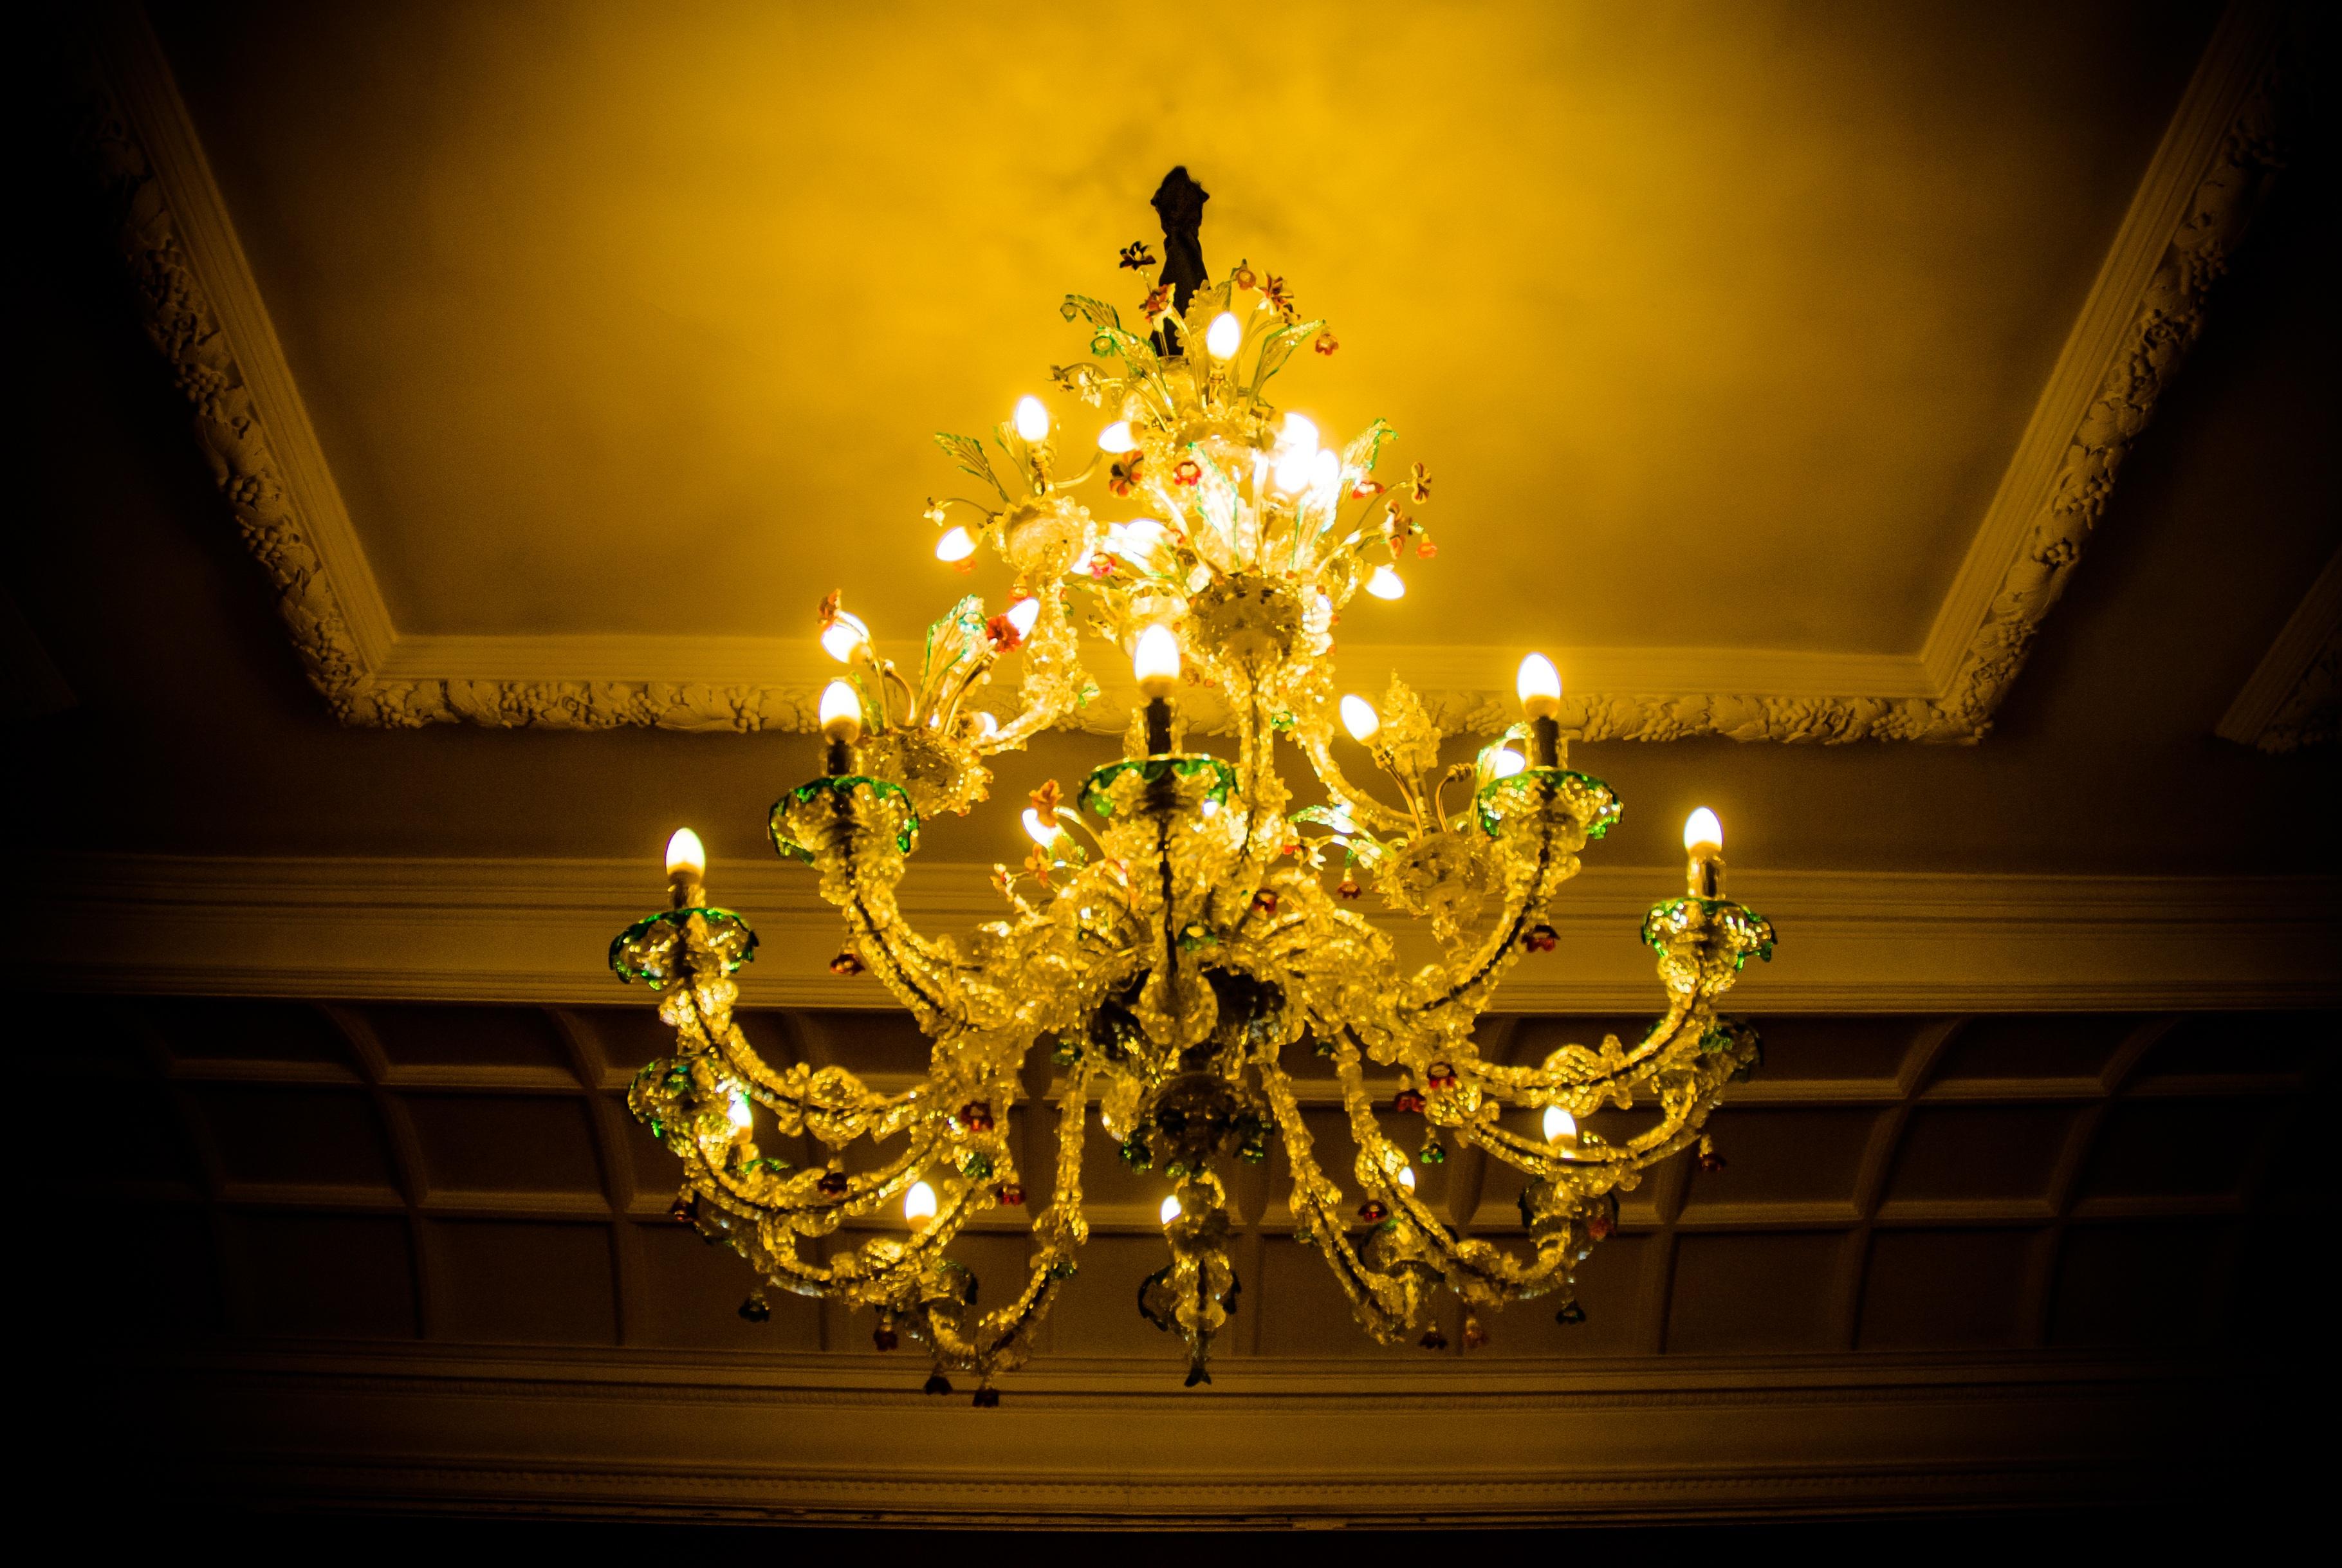 Free images glass palace lamp yellow lighting decor light glass palace lamp yellow lighting decor luggage christmas decoration light fixture chandelier vigo arubaitofo Gallery